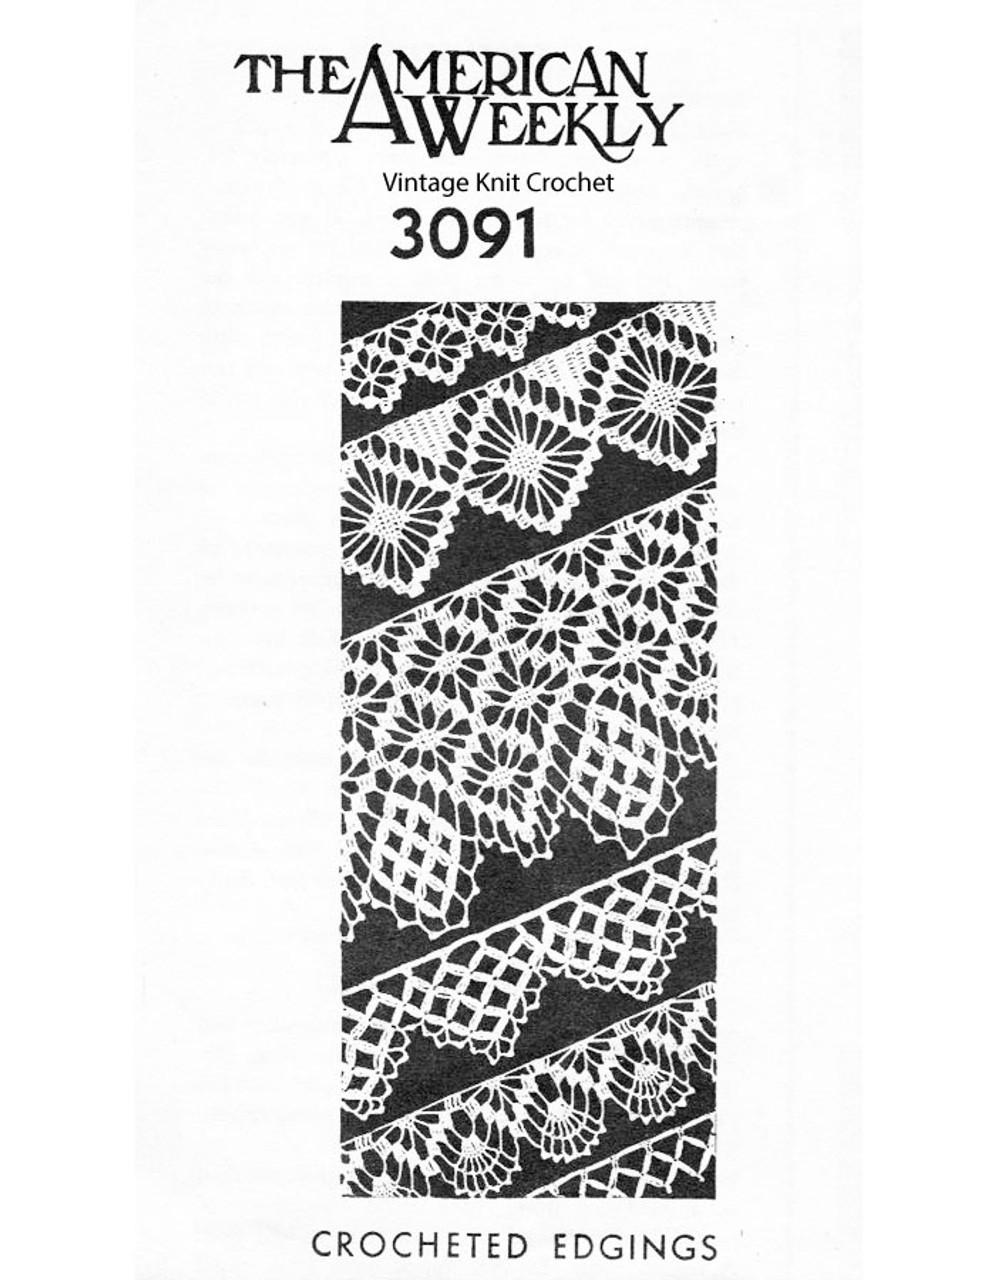 Wide crochet edging pattern, American Weekly 3091